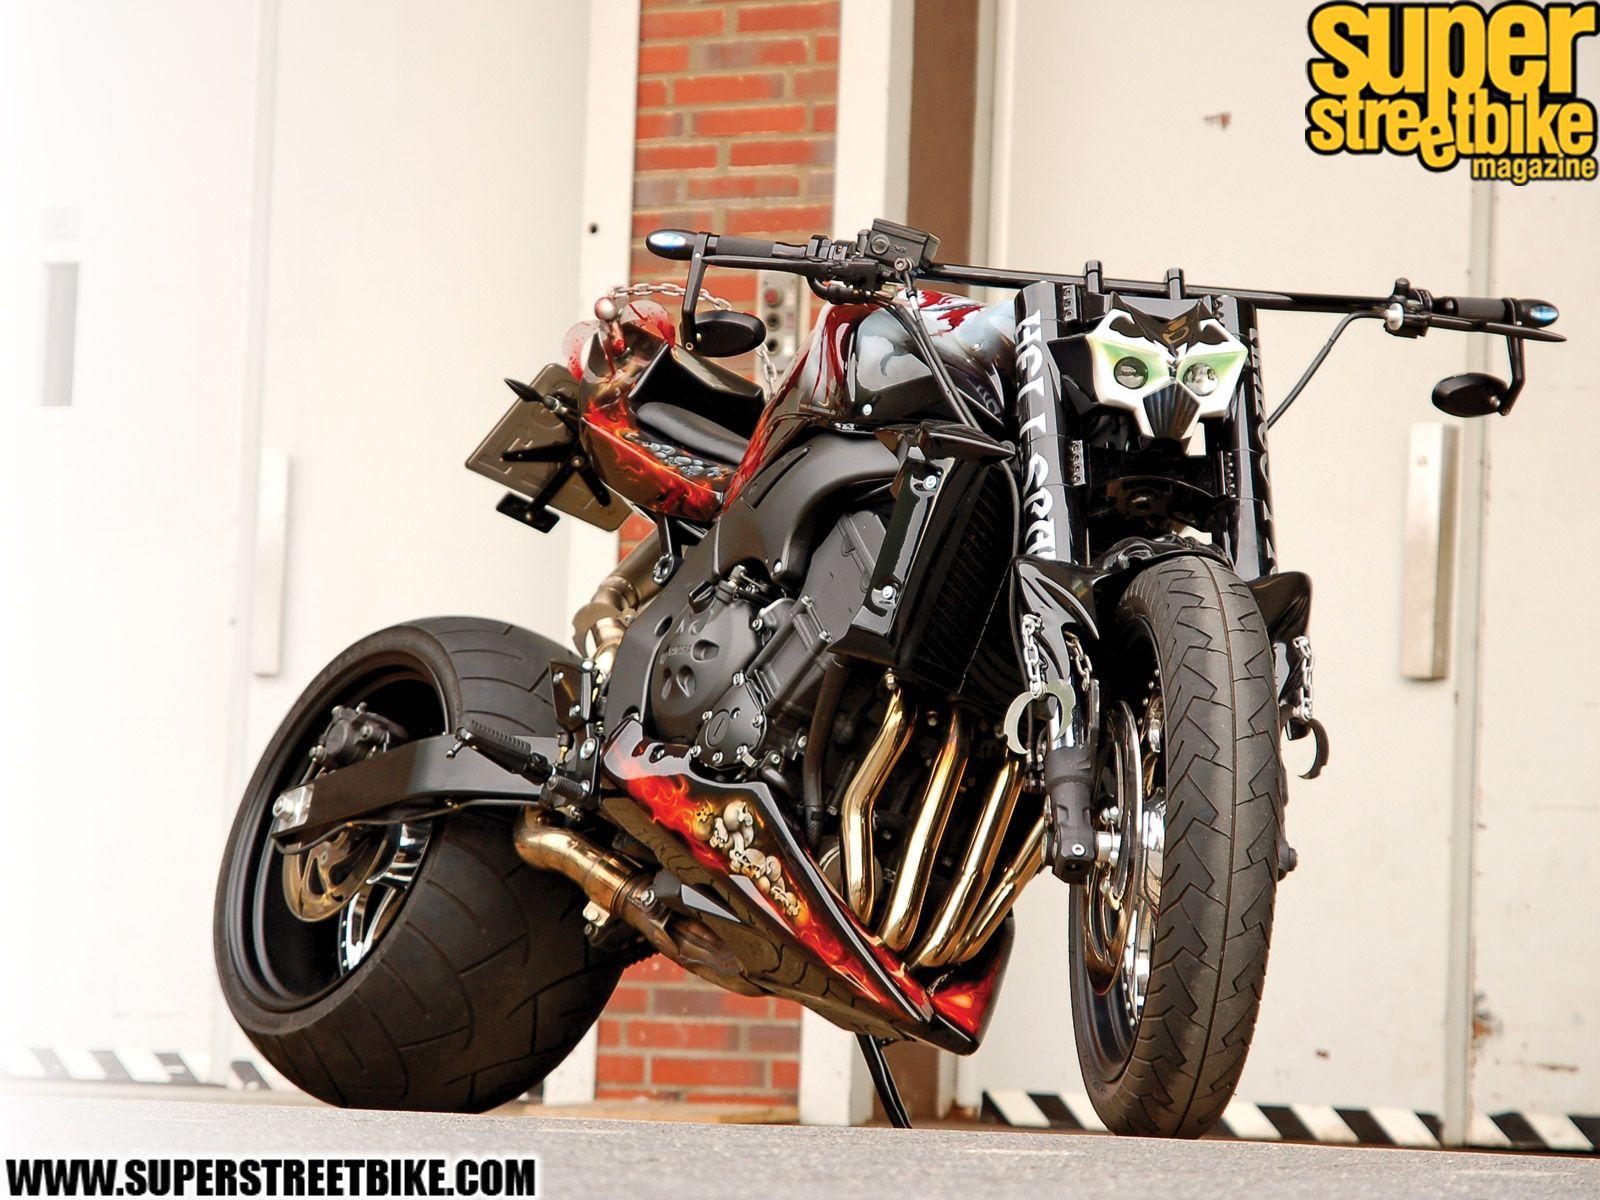 2006 yamaha fz1 tuning 1 moto motorcycle yamaha et. Black Bedroom Furniture Sets. Home Design Ideas